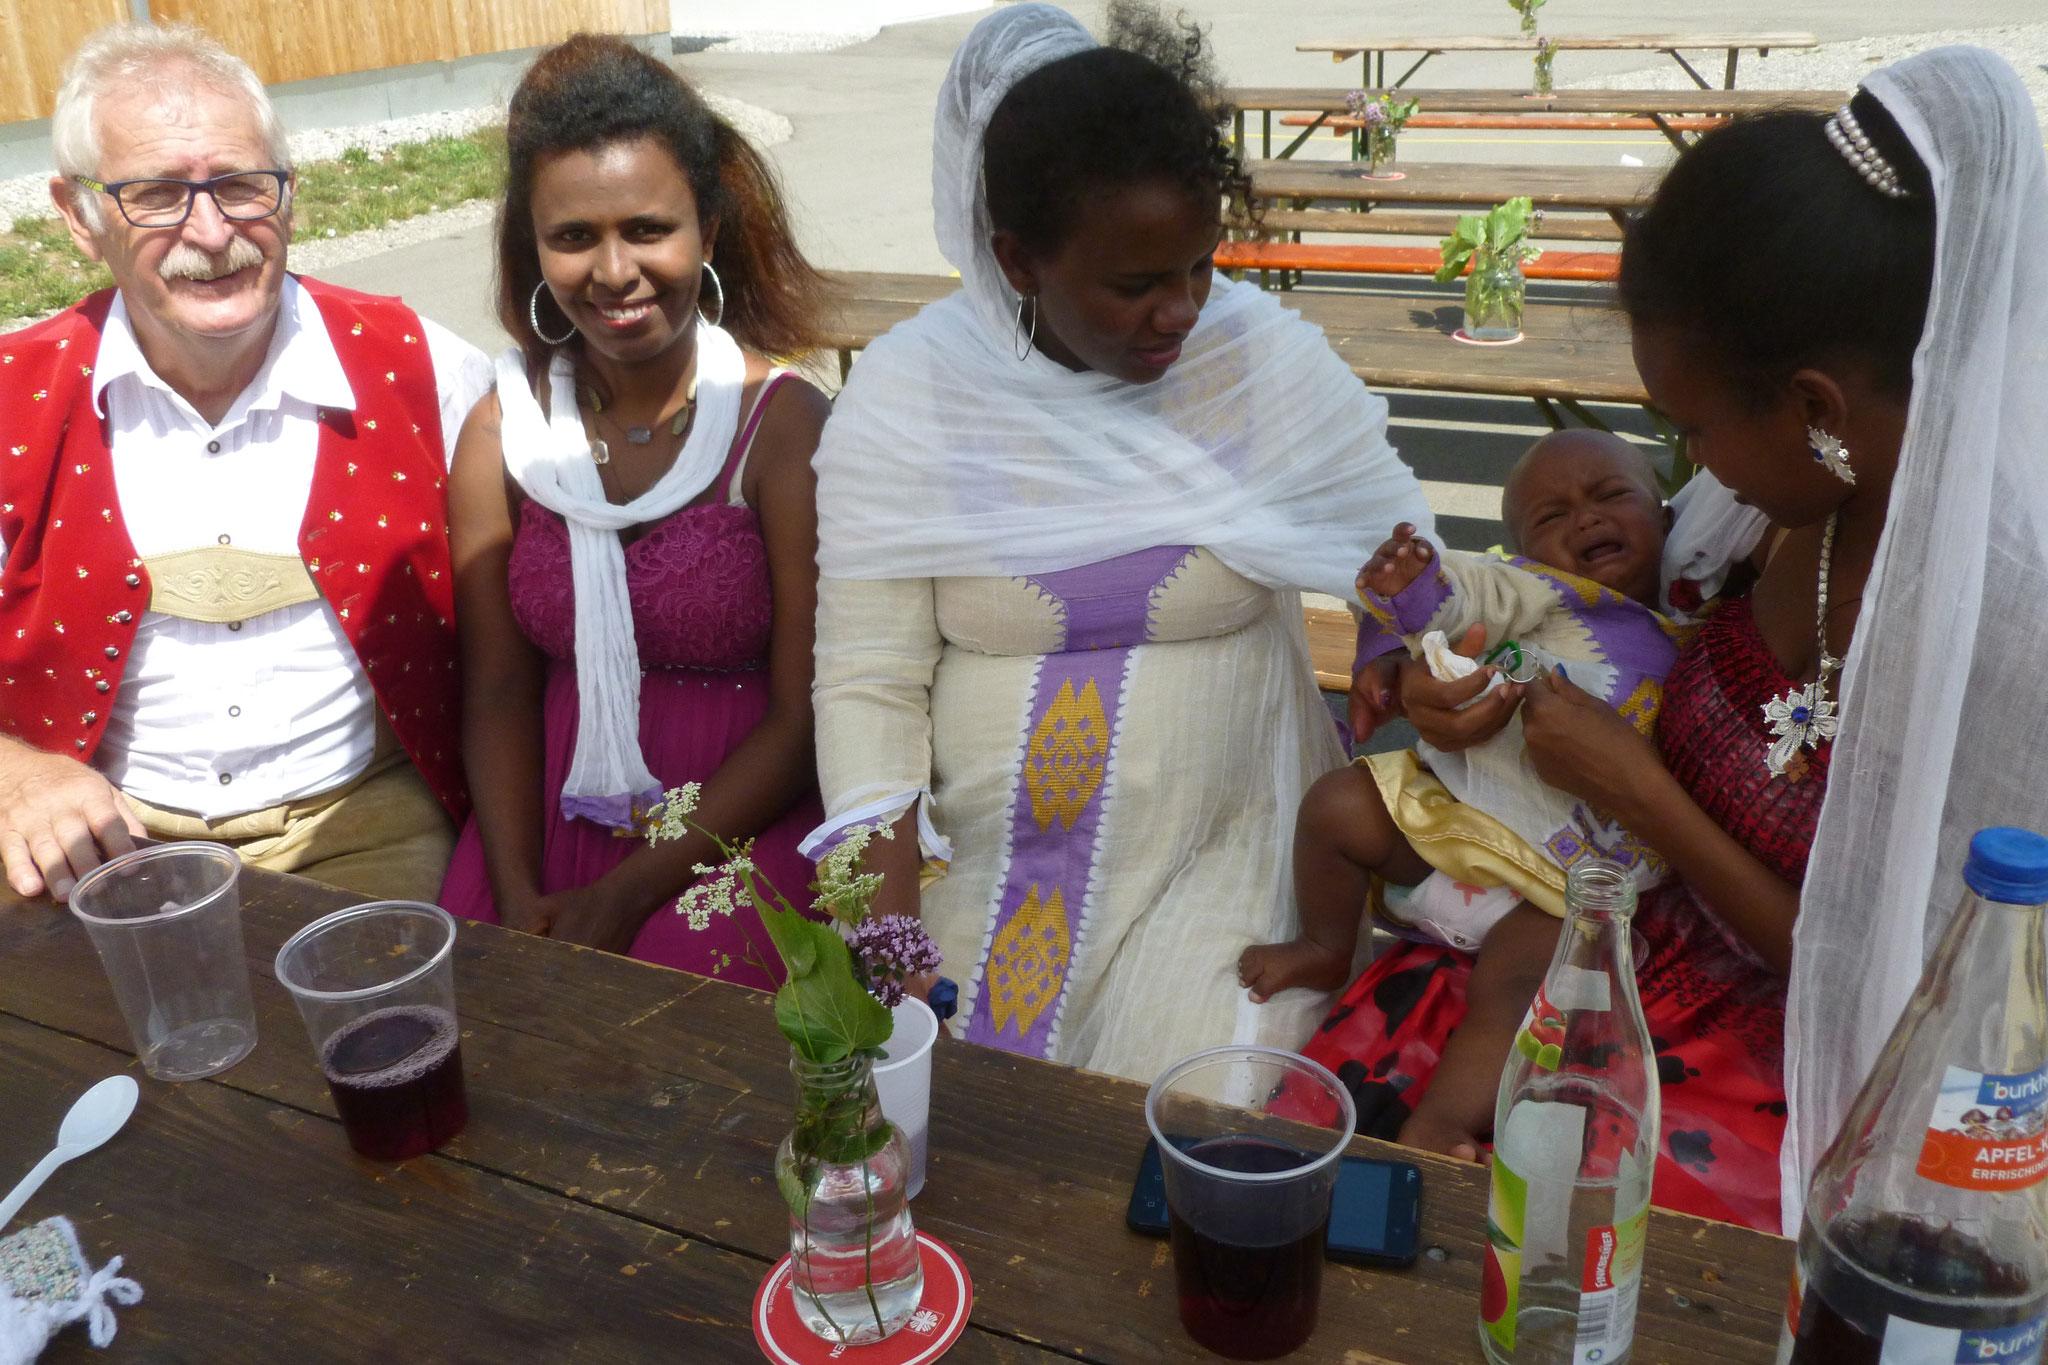 Sommerfest in der Flüchtlingsunterkunft